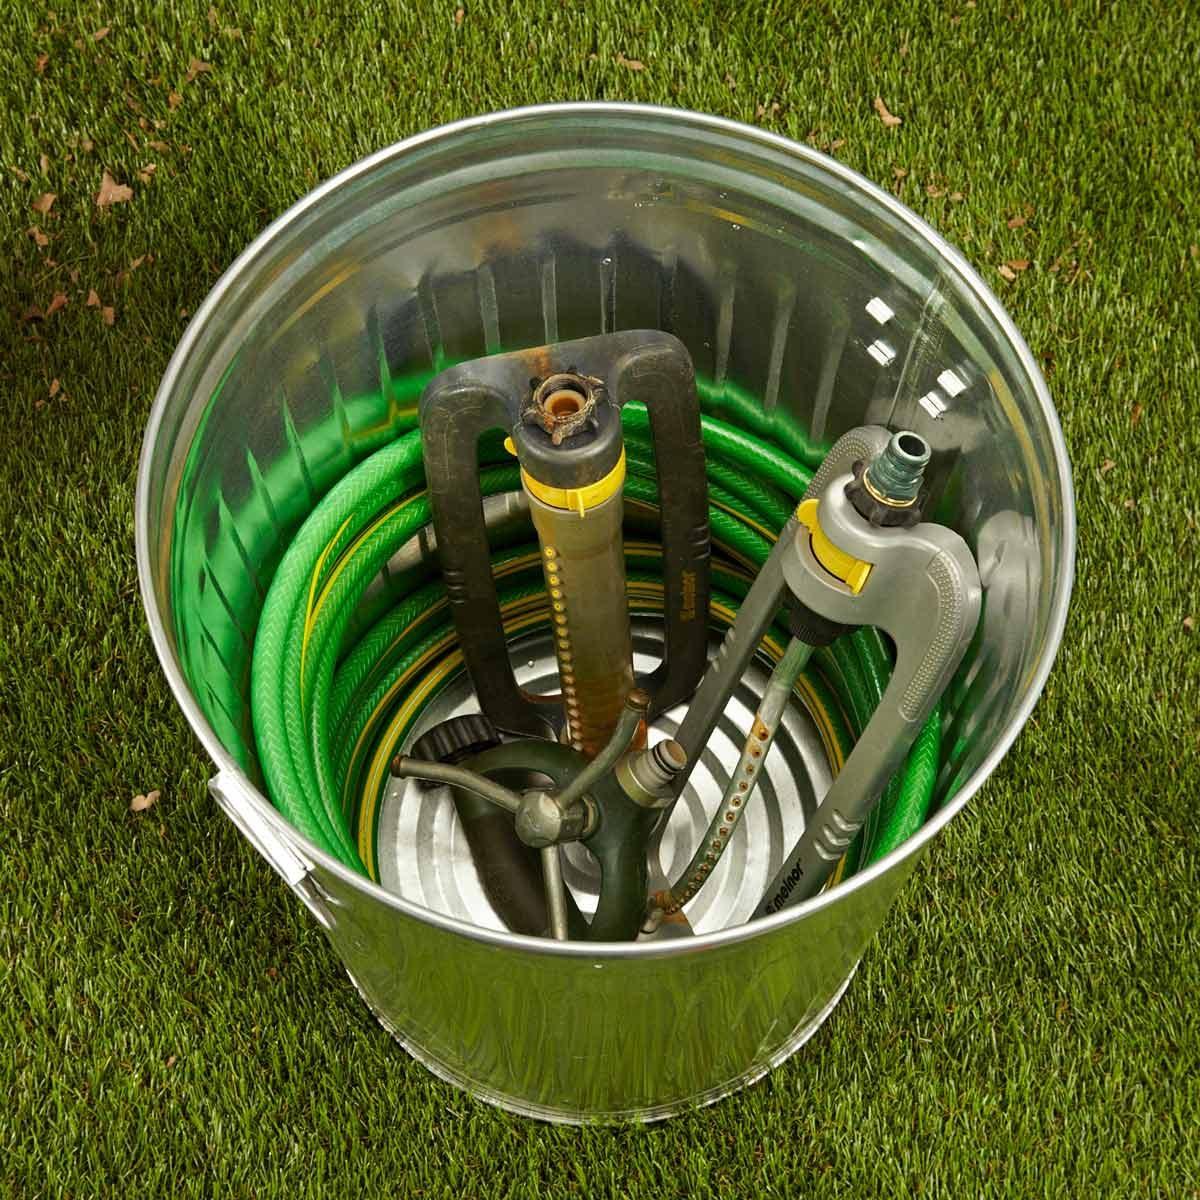 FH16APR_567_08_023 garbage can hose caddy sprinkler